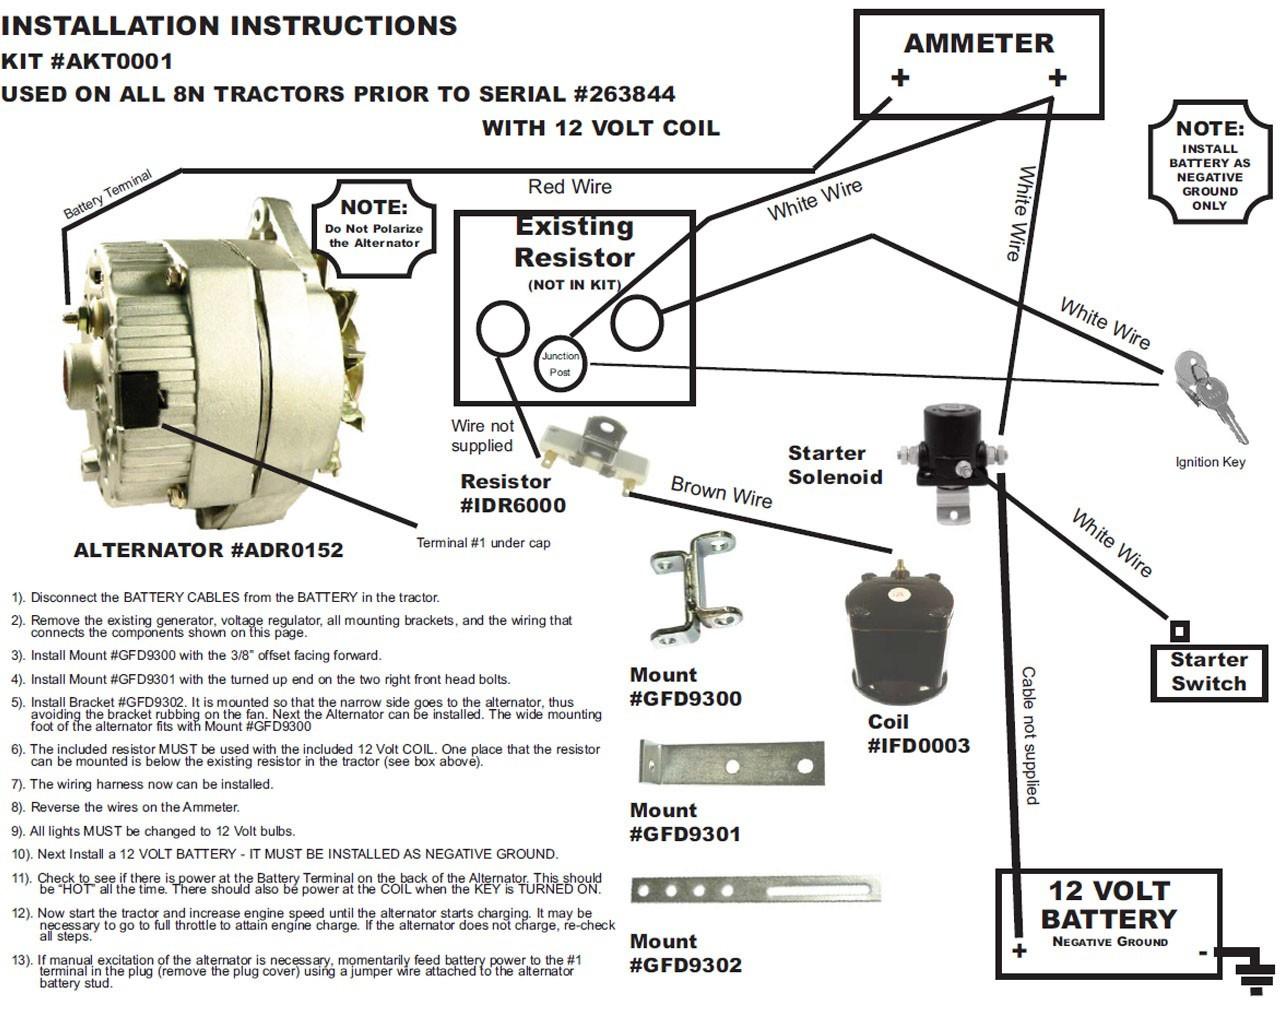 6 volt to 12 volt conversion wiring diagram jeep cj3a 1953 universal turn signal wiring diagram 12 volt ammeter wiring diagram wiring